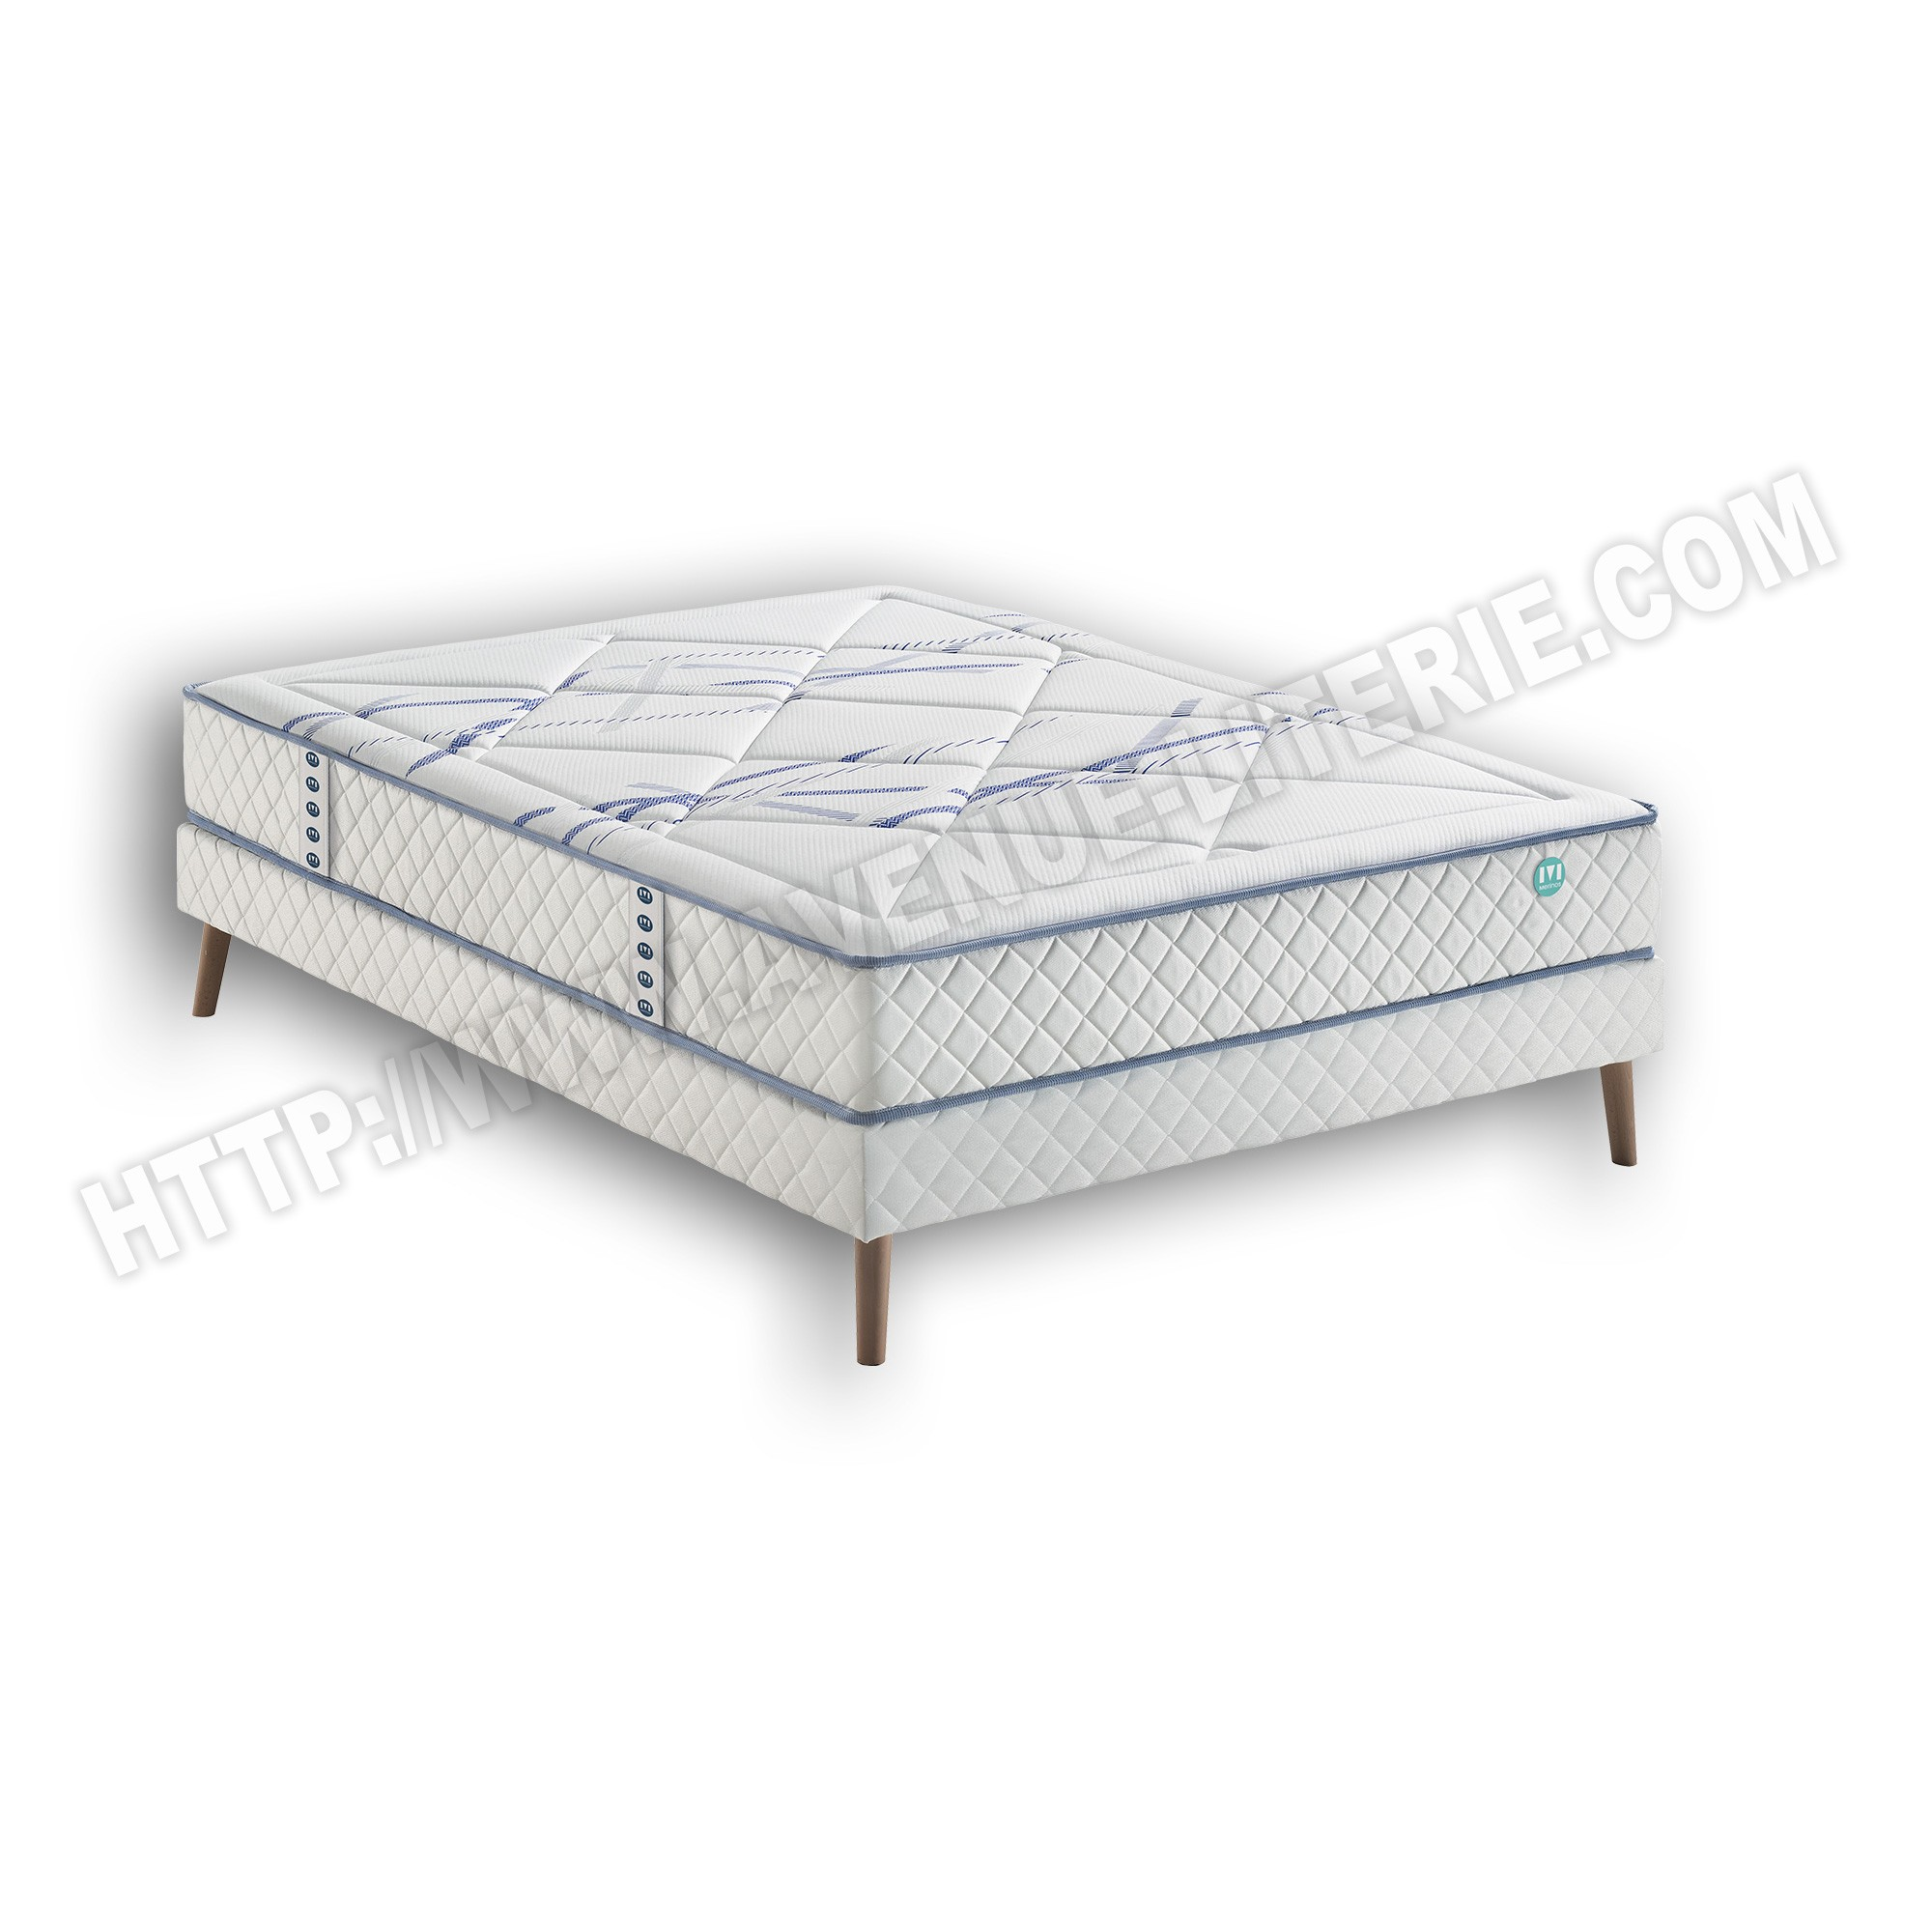 matelas merinos 140x190 trendy matelas bultex yacano x. Black Bedroom Furniture Sets. Home Design Ideas